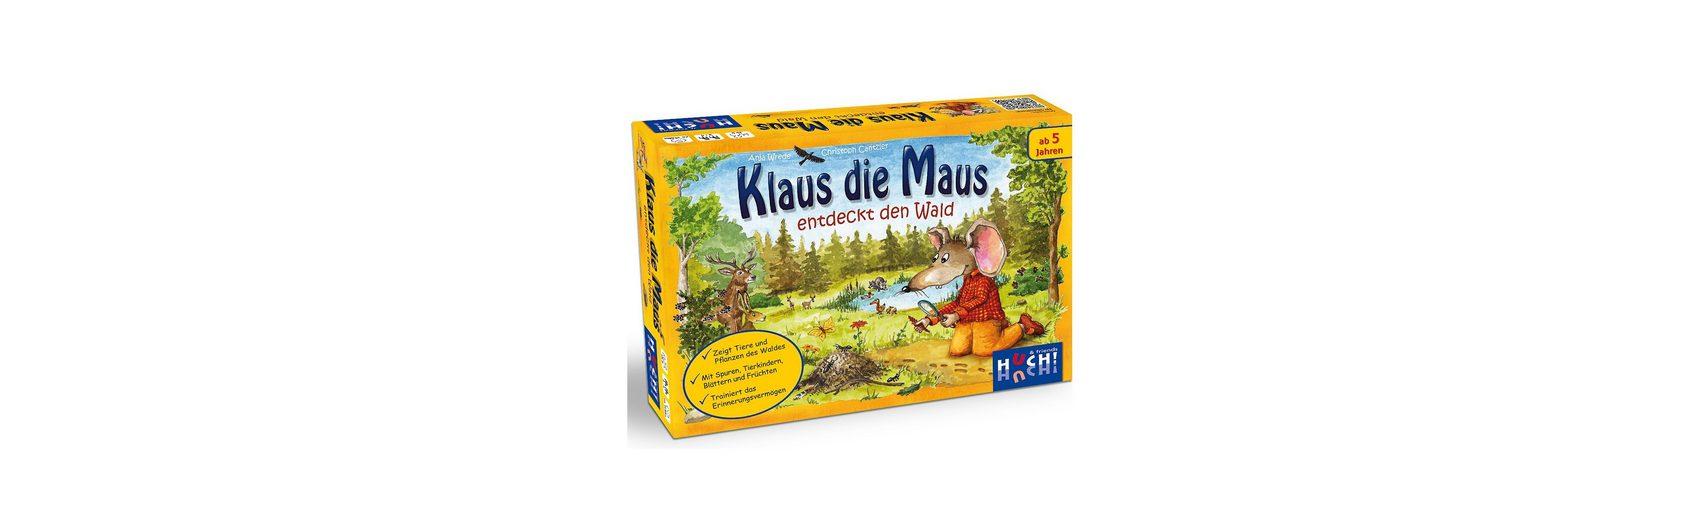 HUCH! & friends Klaus die Maus entdeckt den Wald